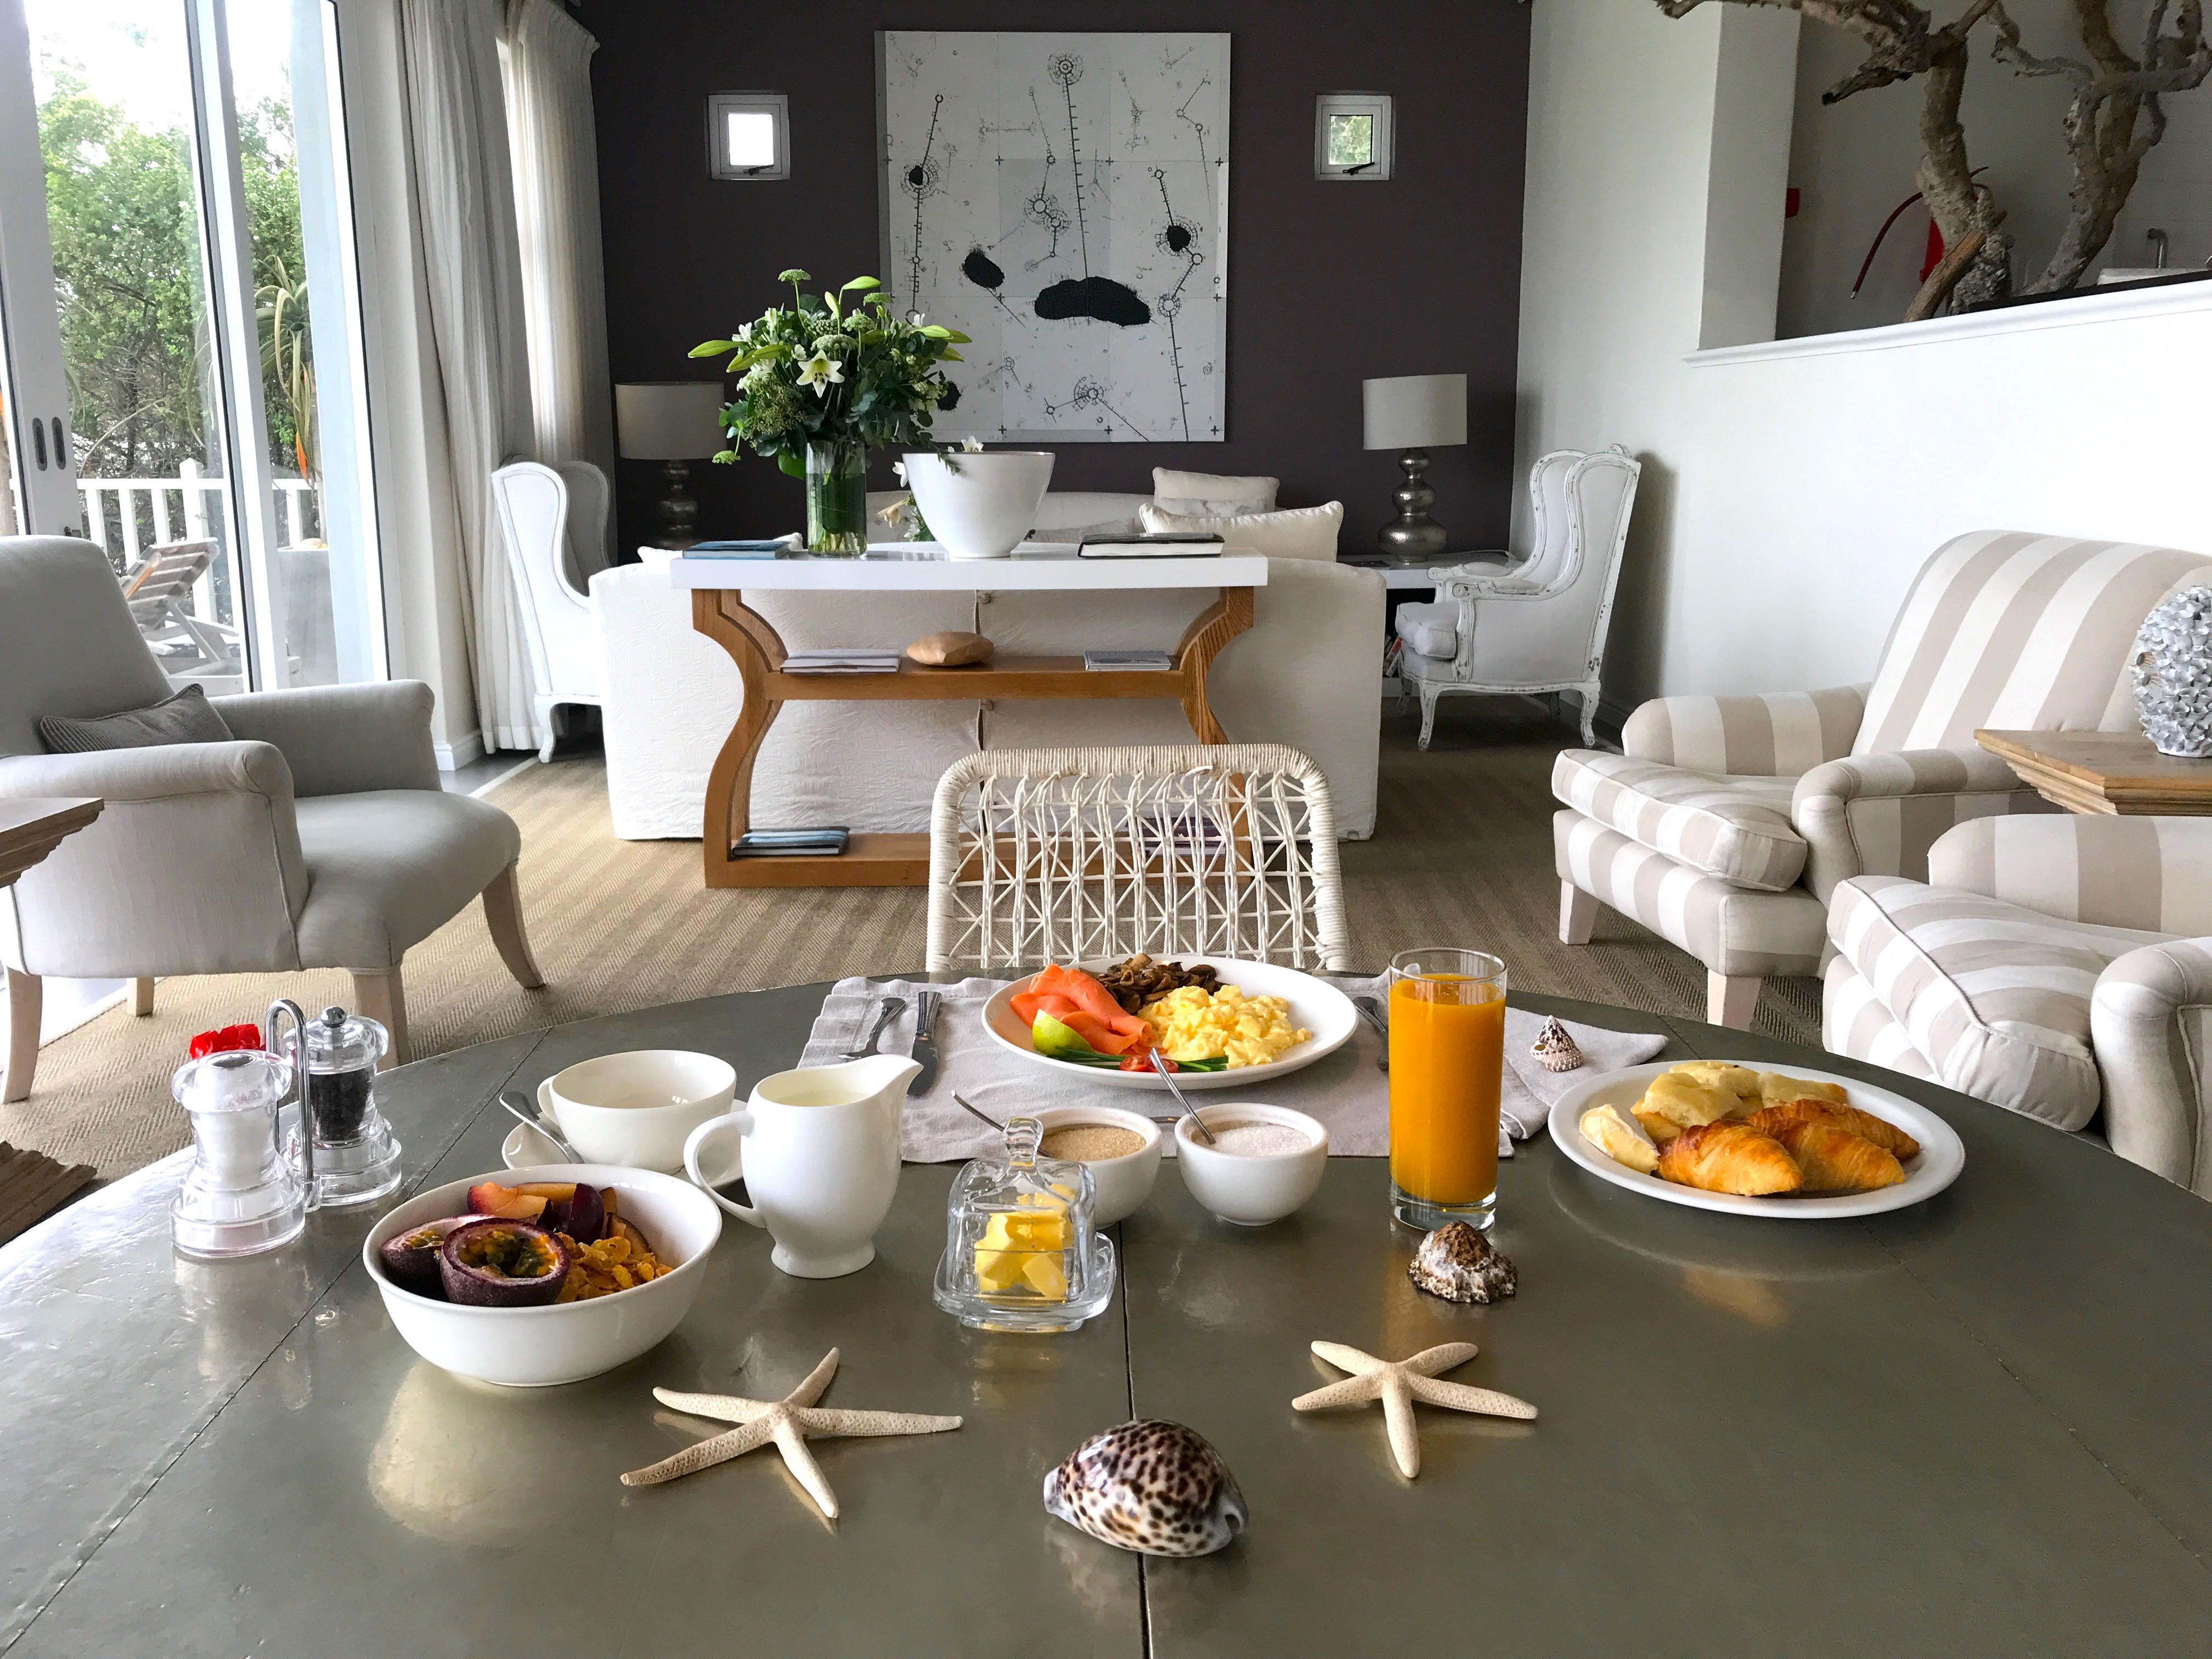 breakfast-seafivehotel-campsbay-capetown-lustforthesublime